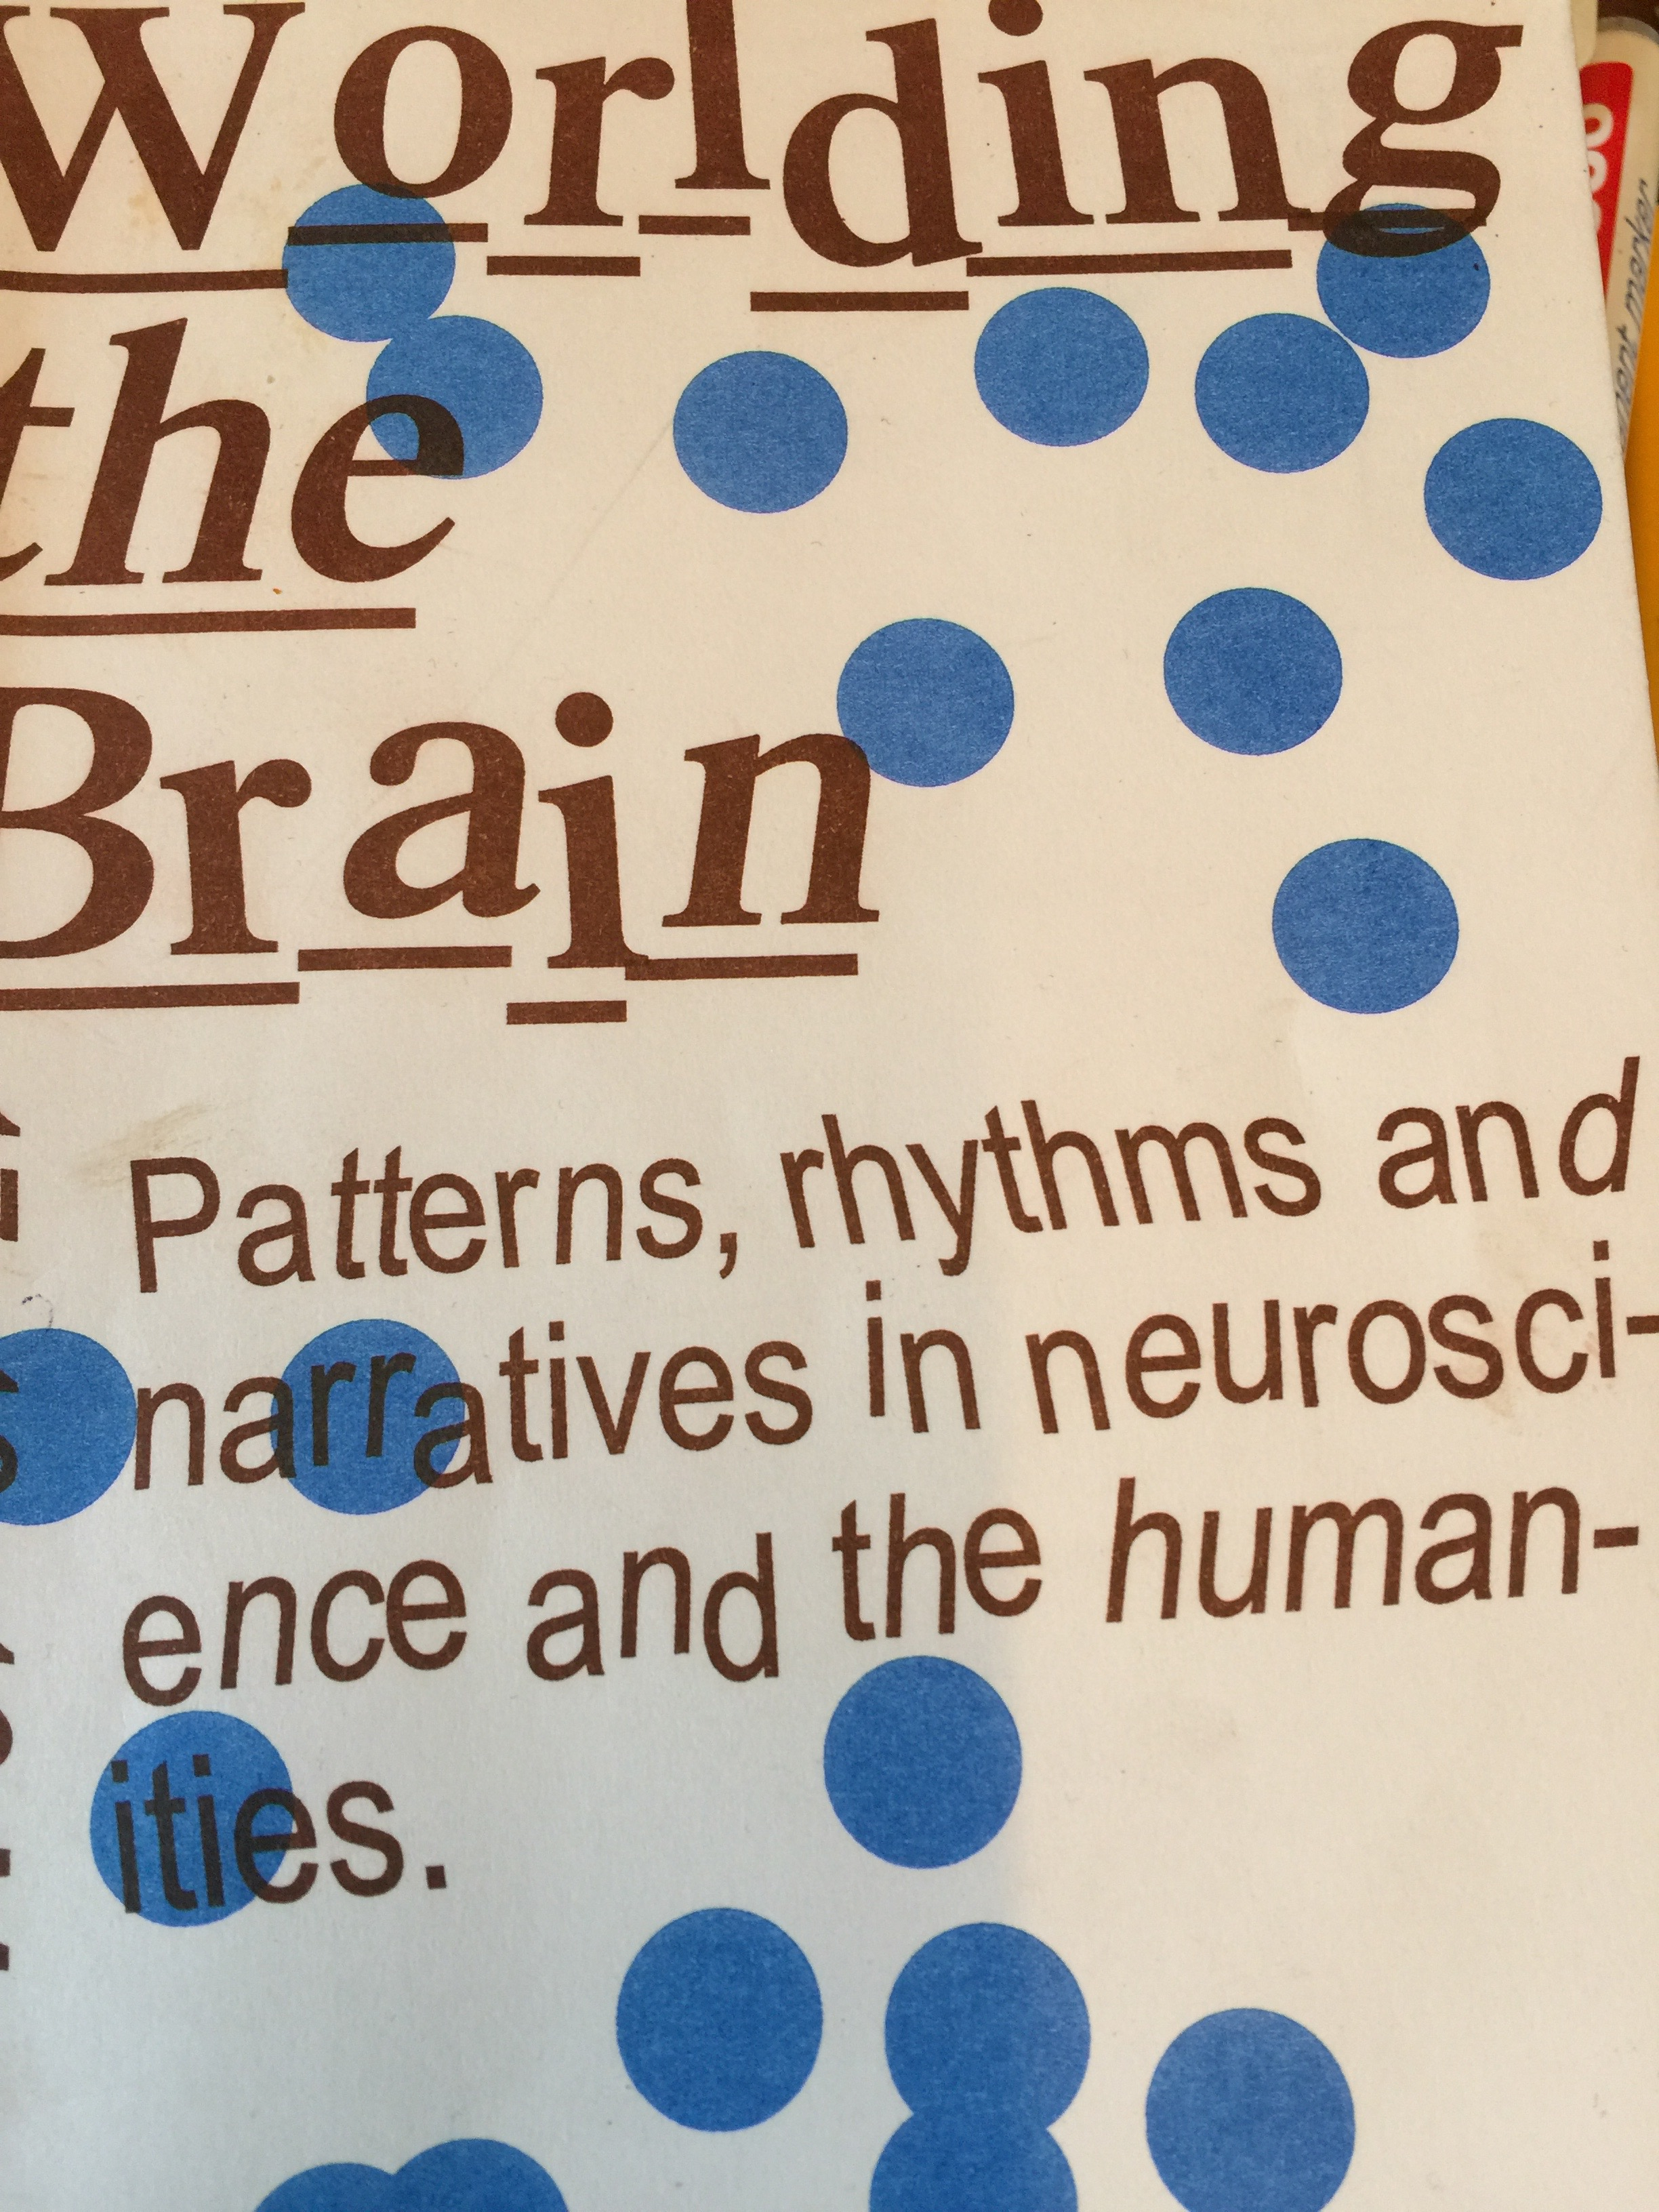 Worlding the Brain